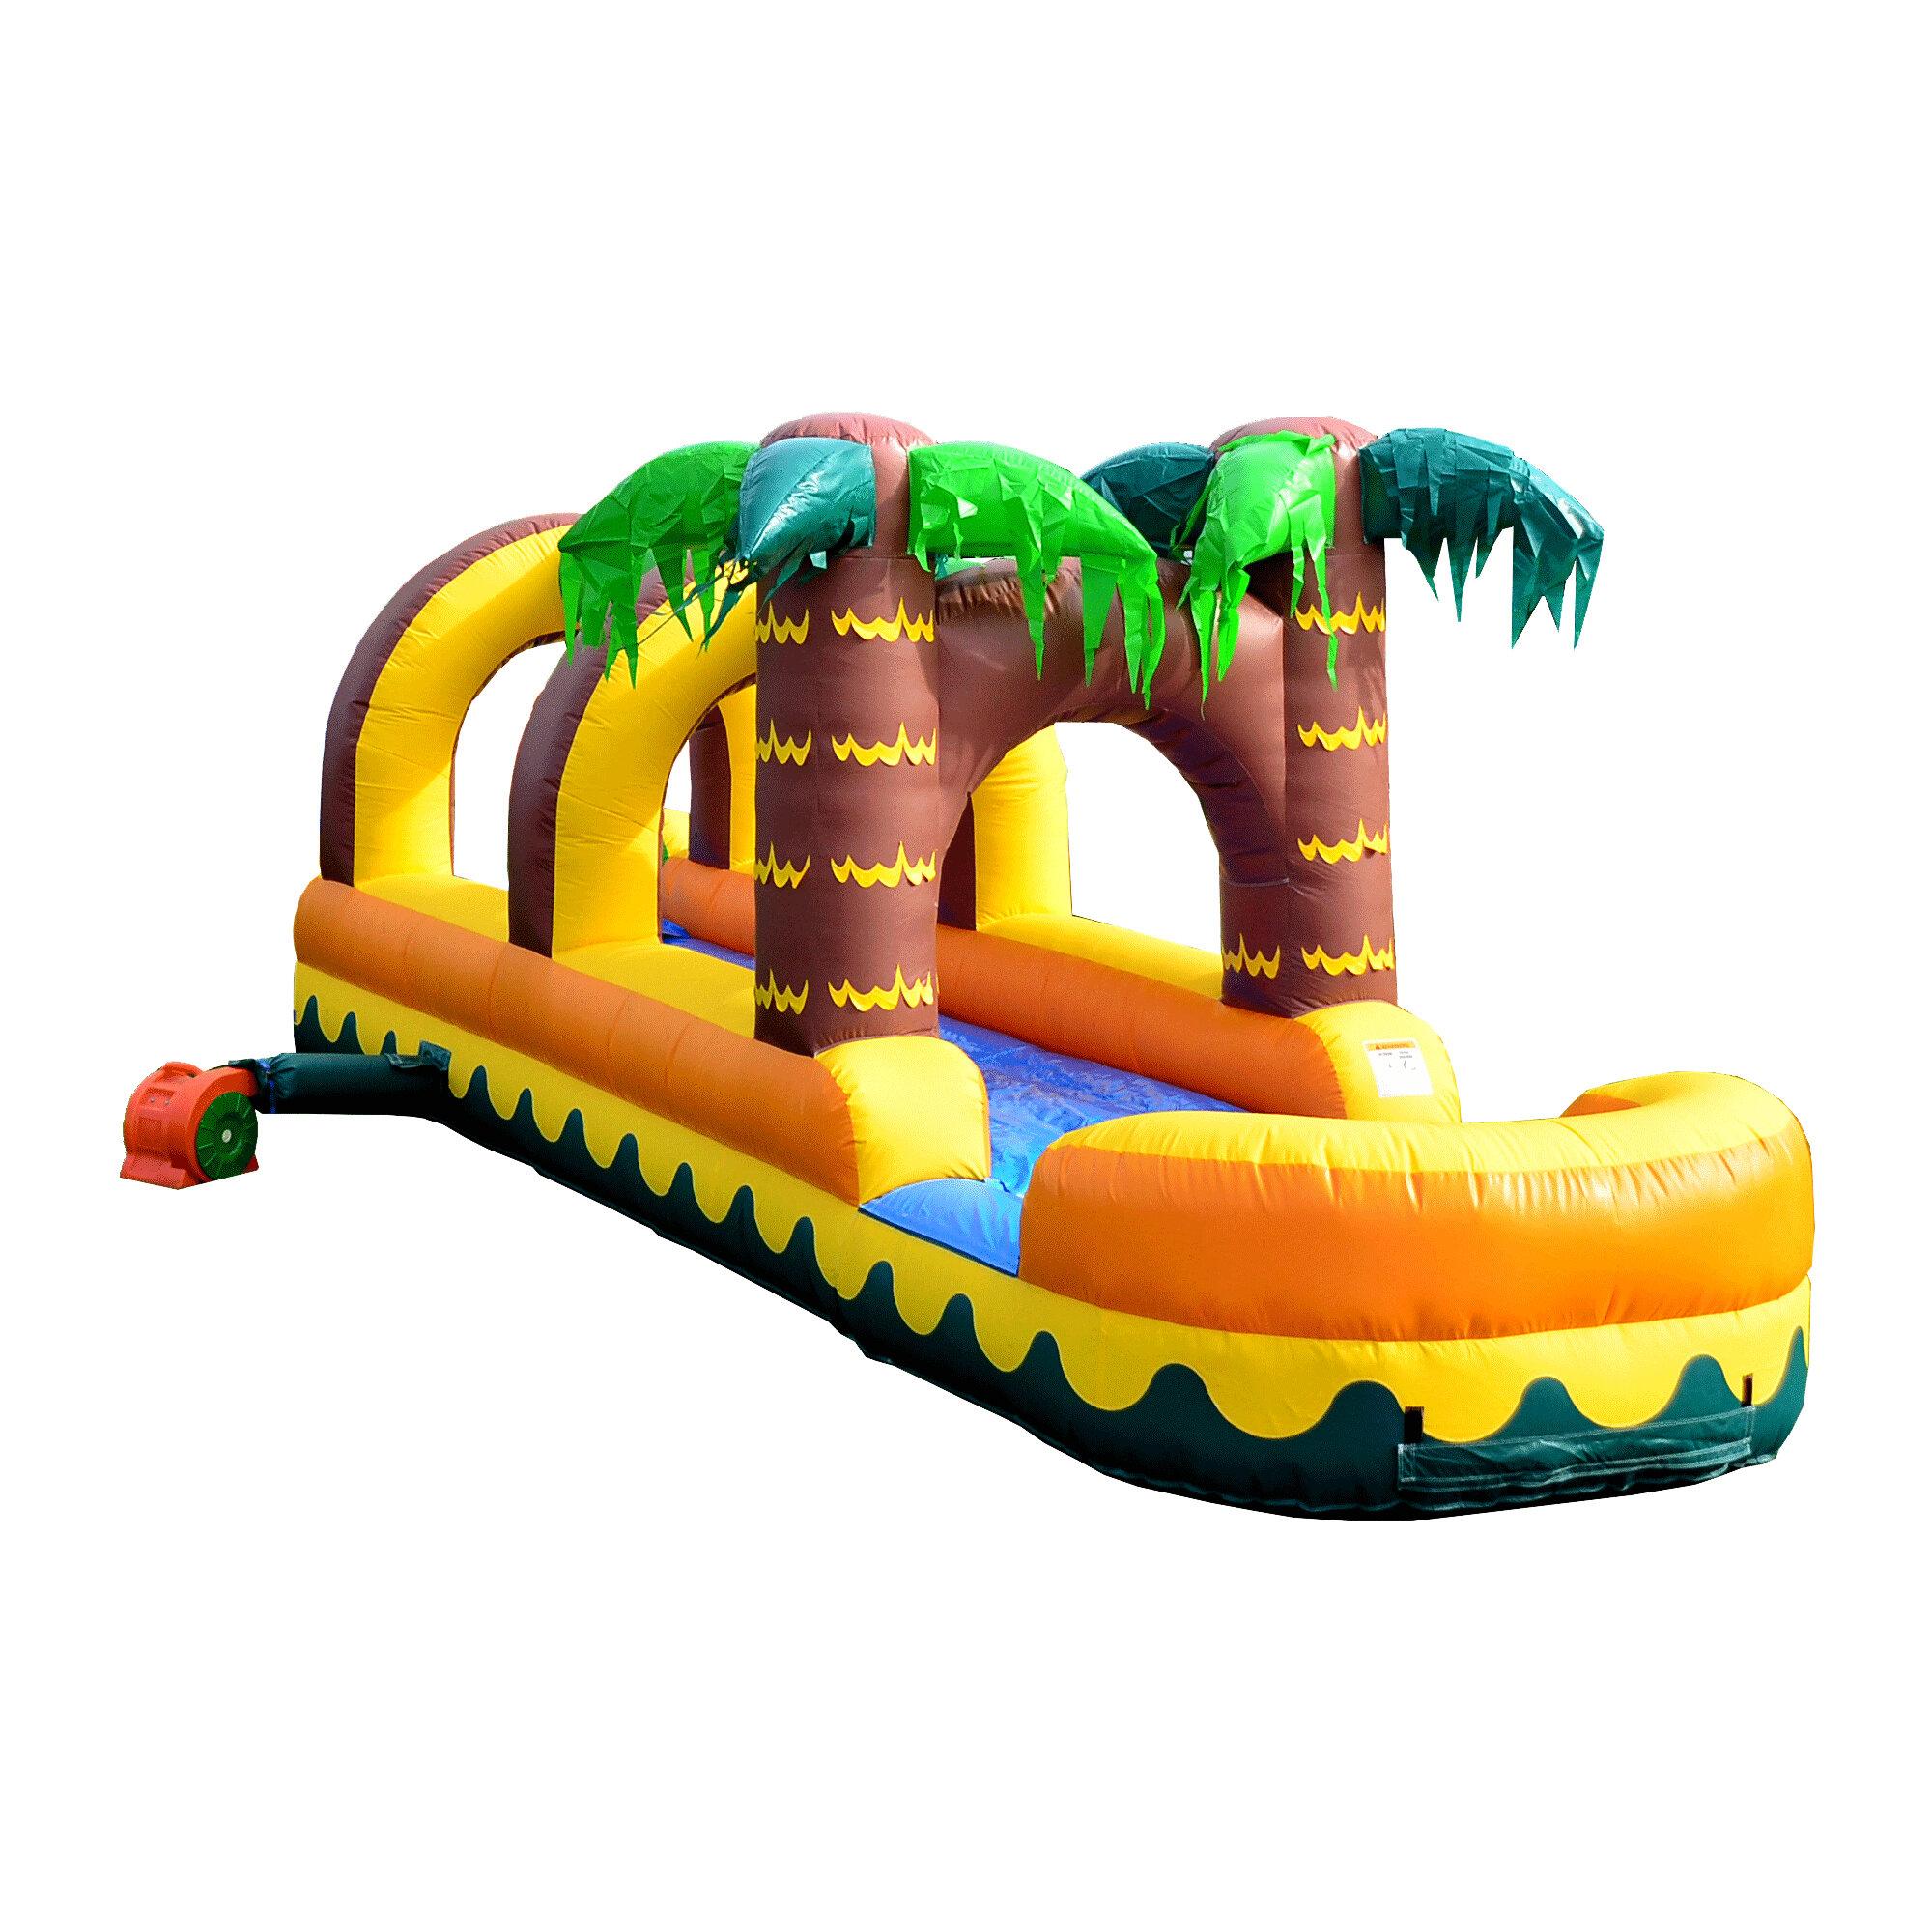 41d5238e5e8db JumpOrange Aloha Tropical Inflatable Slip N Slide Bounce House